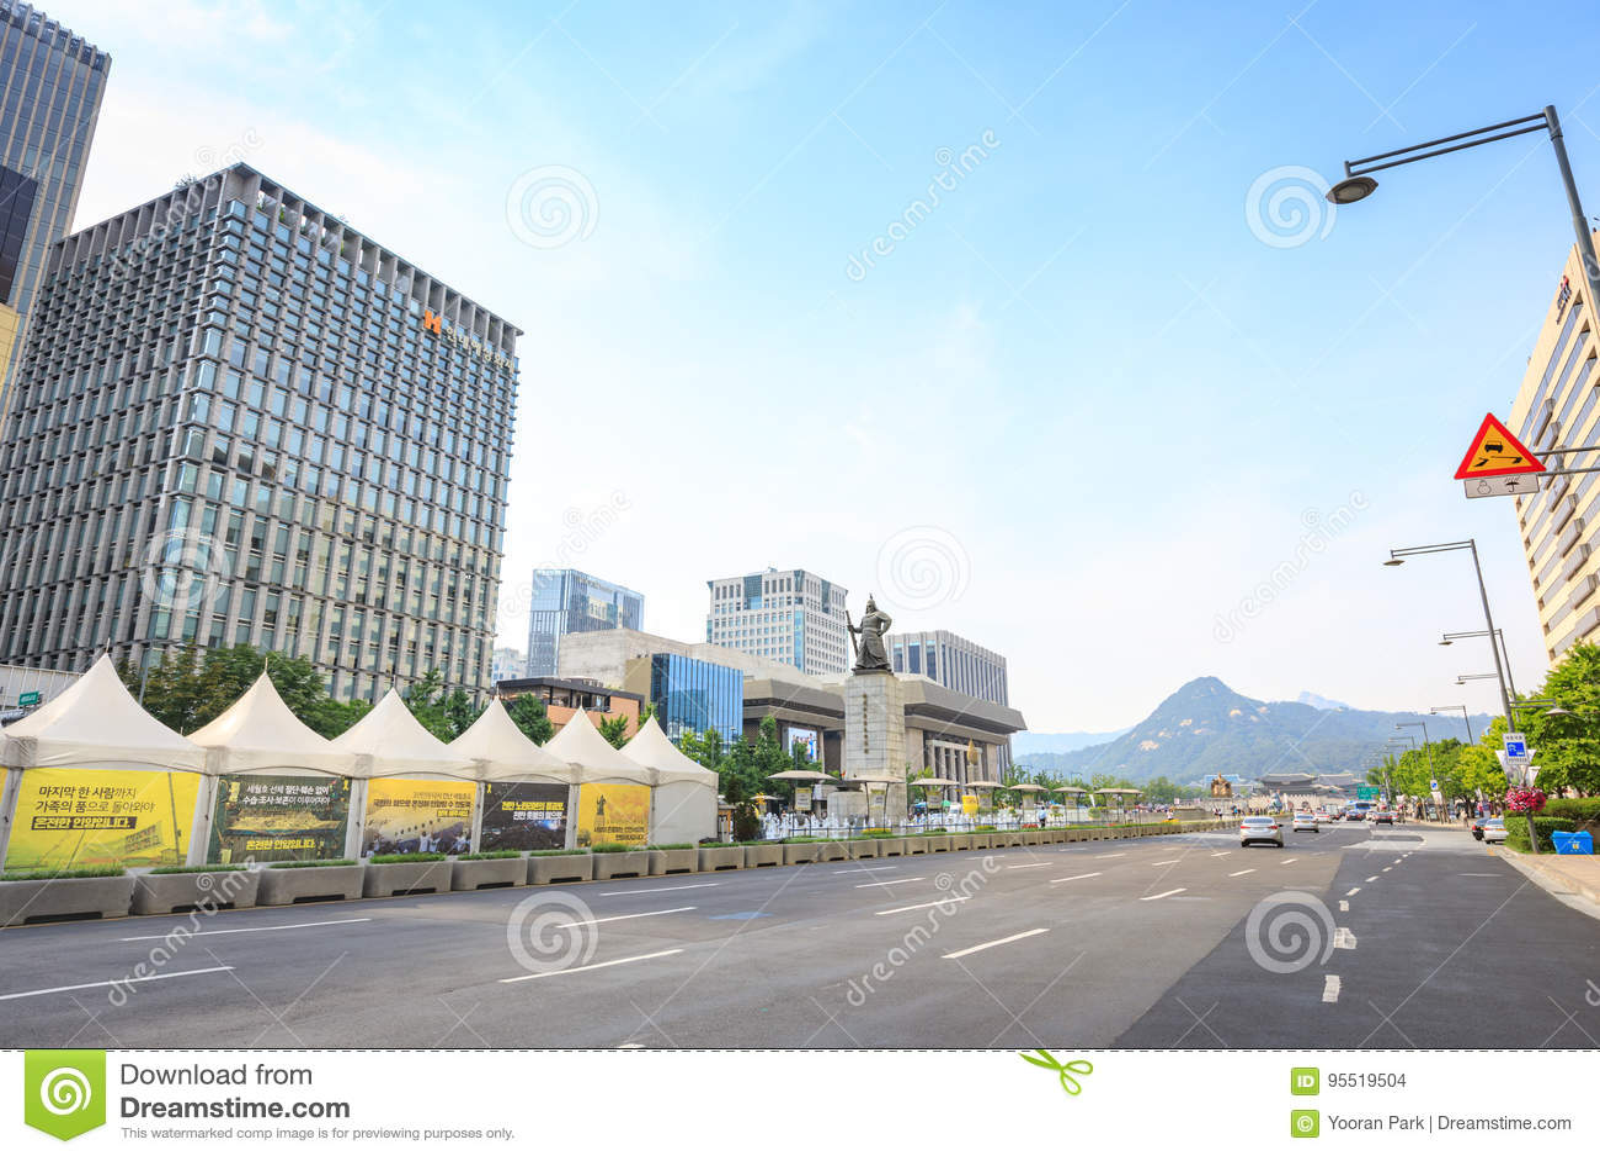 Jun 19, 2017 Gwanghwamun Plaza with the statue of the Admiral Yi Sun-sin in Seoul City, South Korea